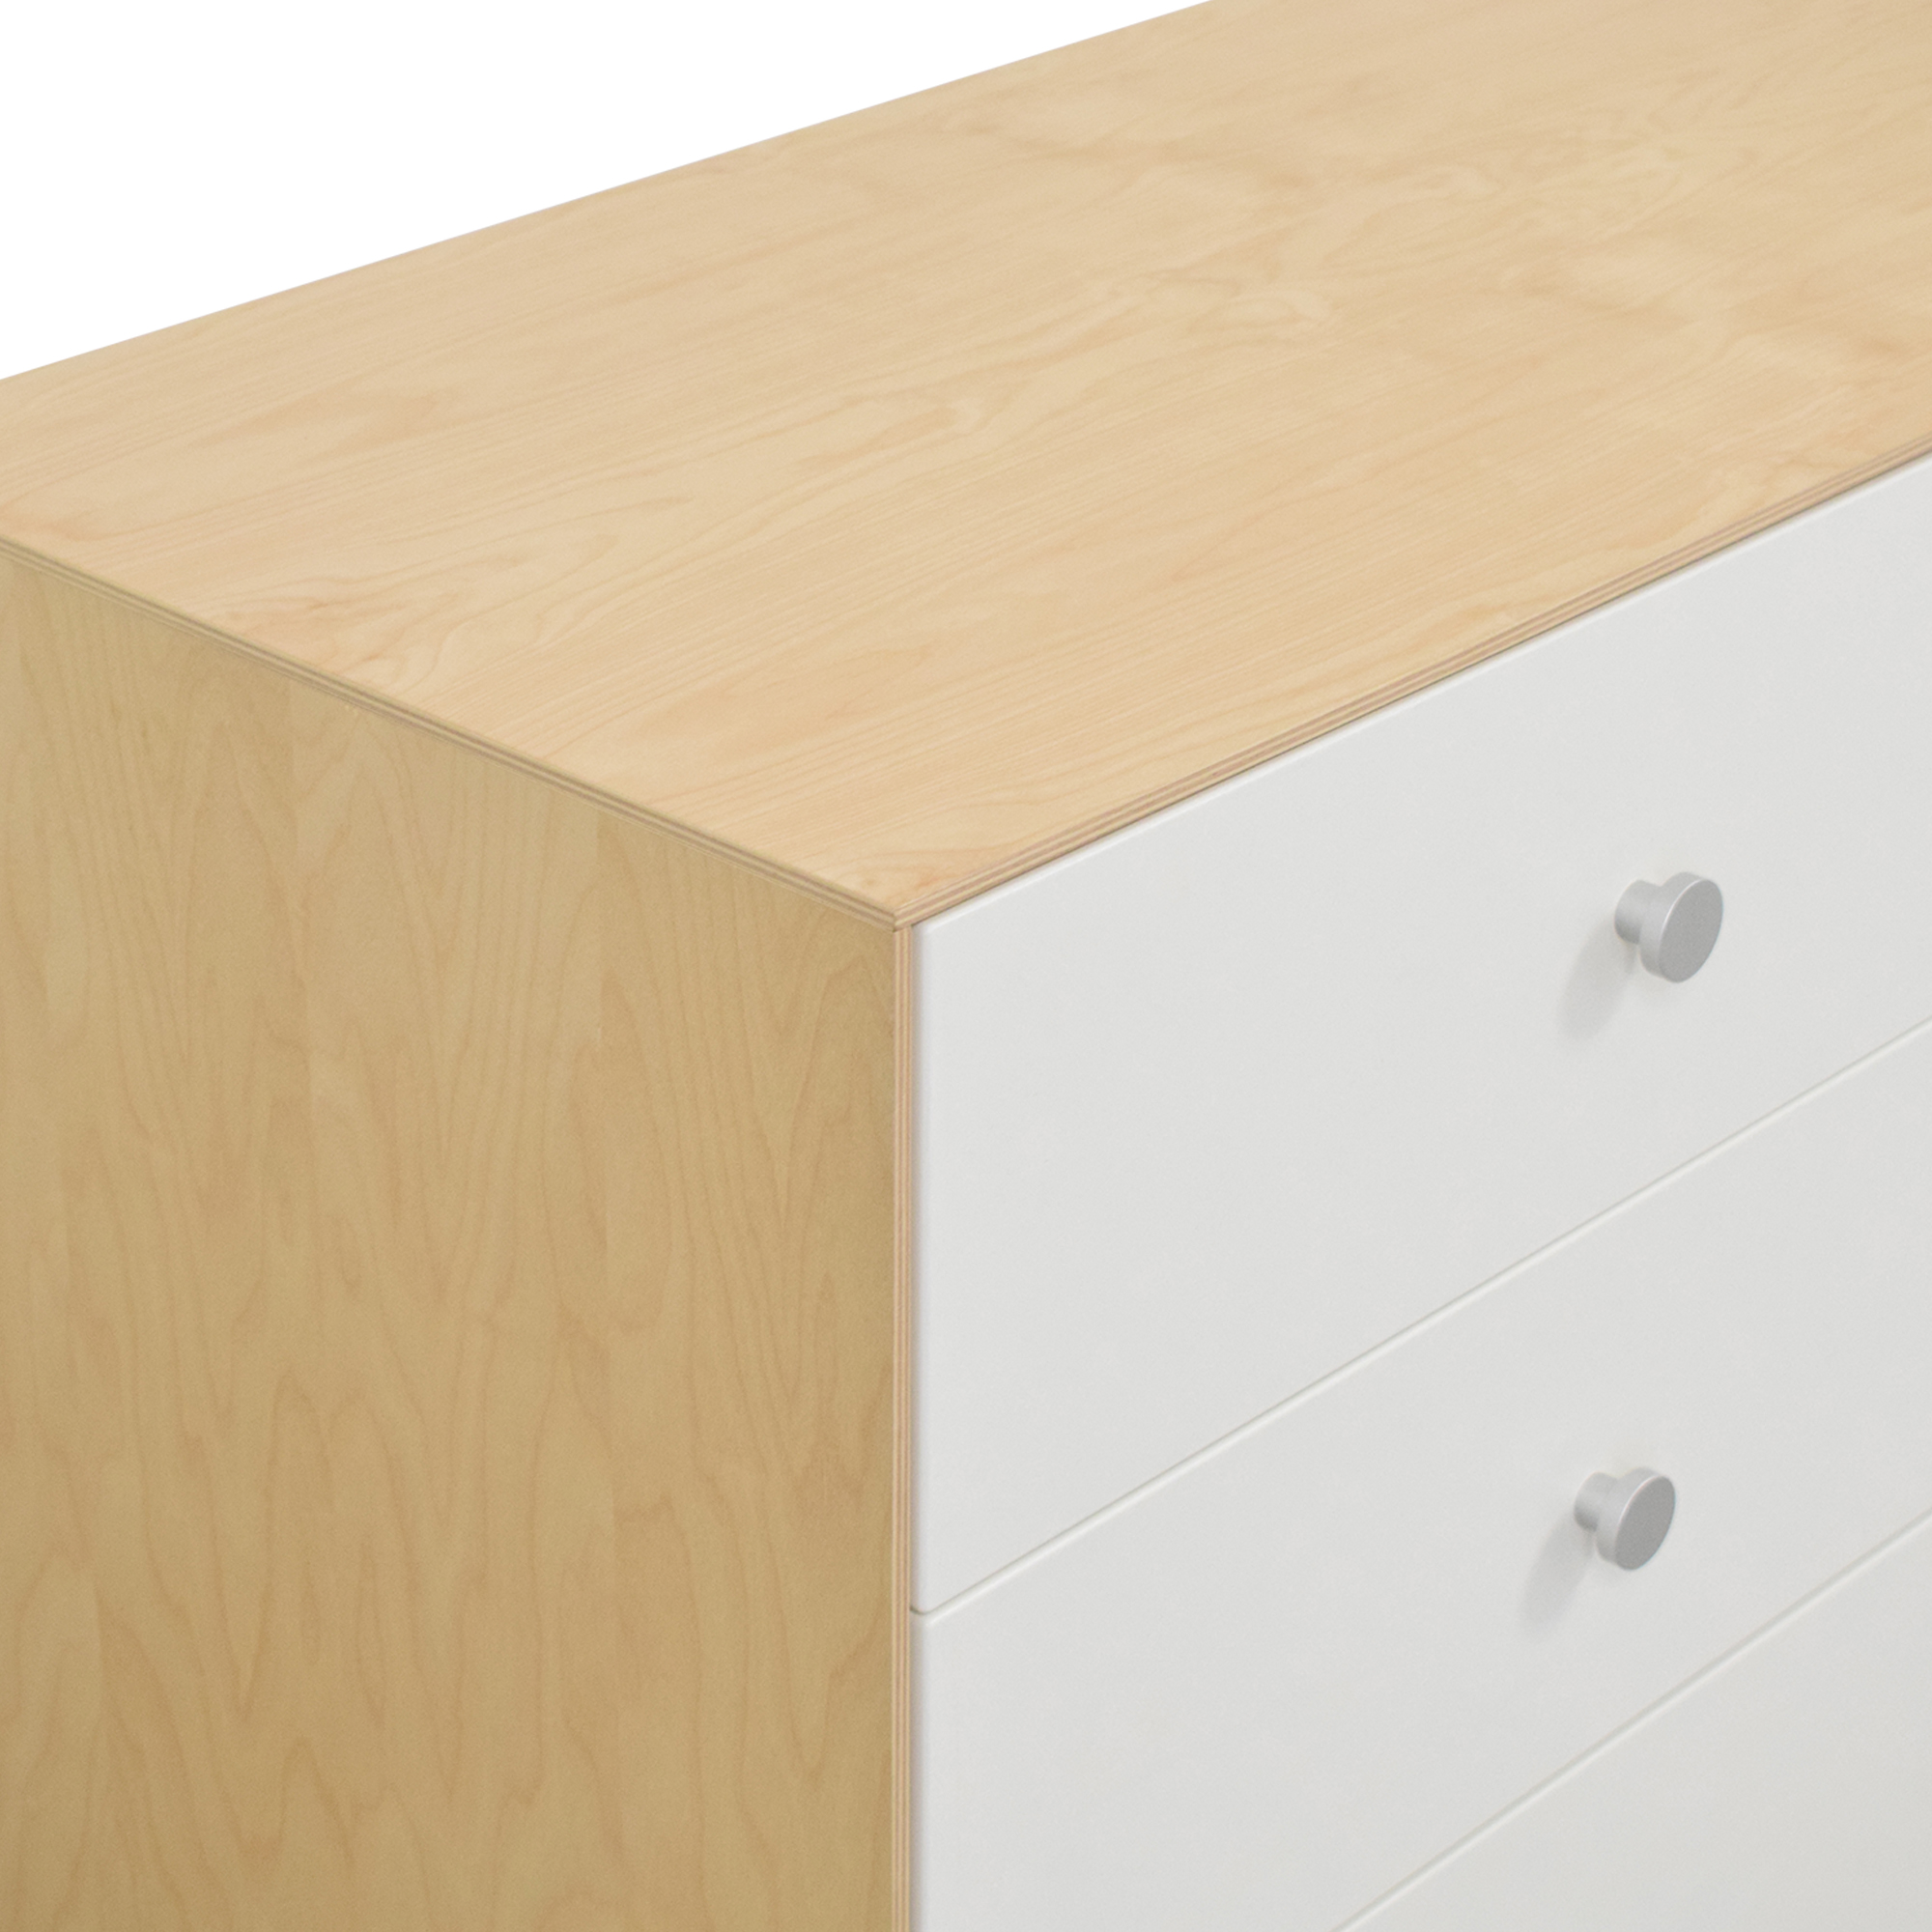 Oeuf Oeuf Merlin Rhea 6 Drawer Dresser on sale